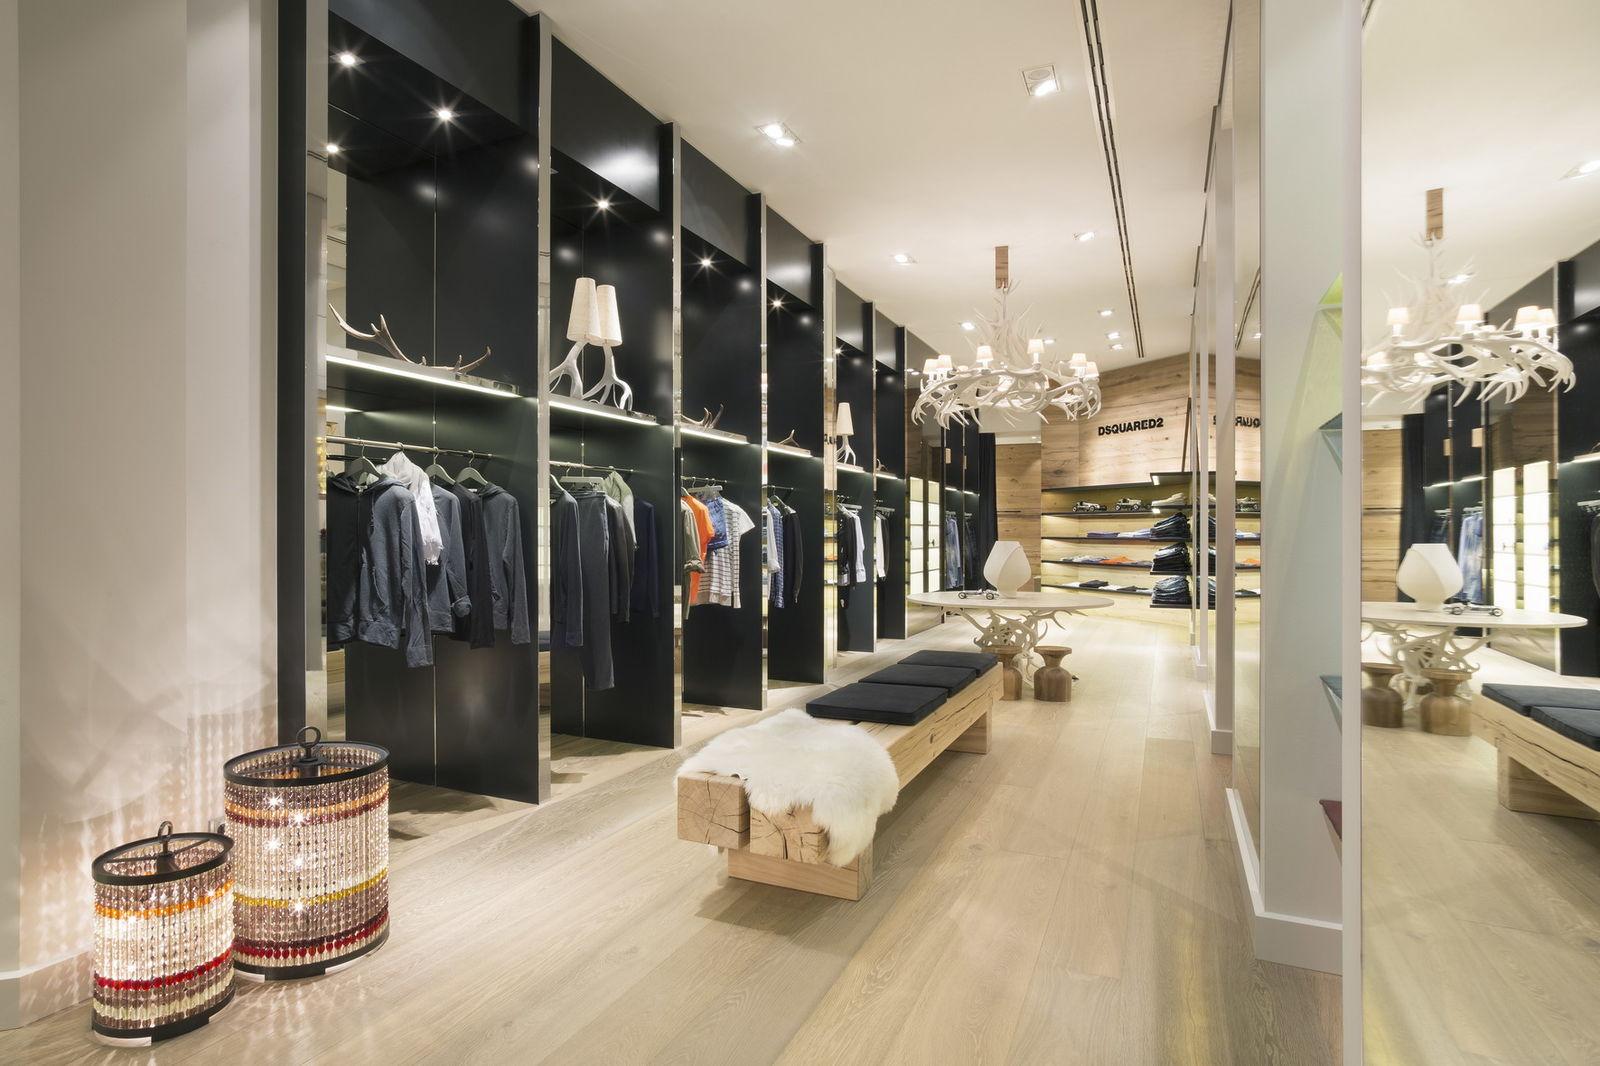 APROPOS The Concept Store in München (Bild 8)